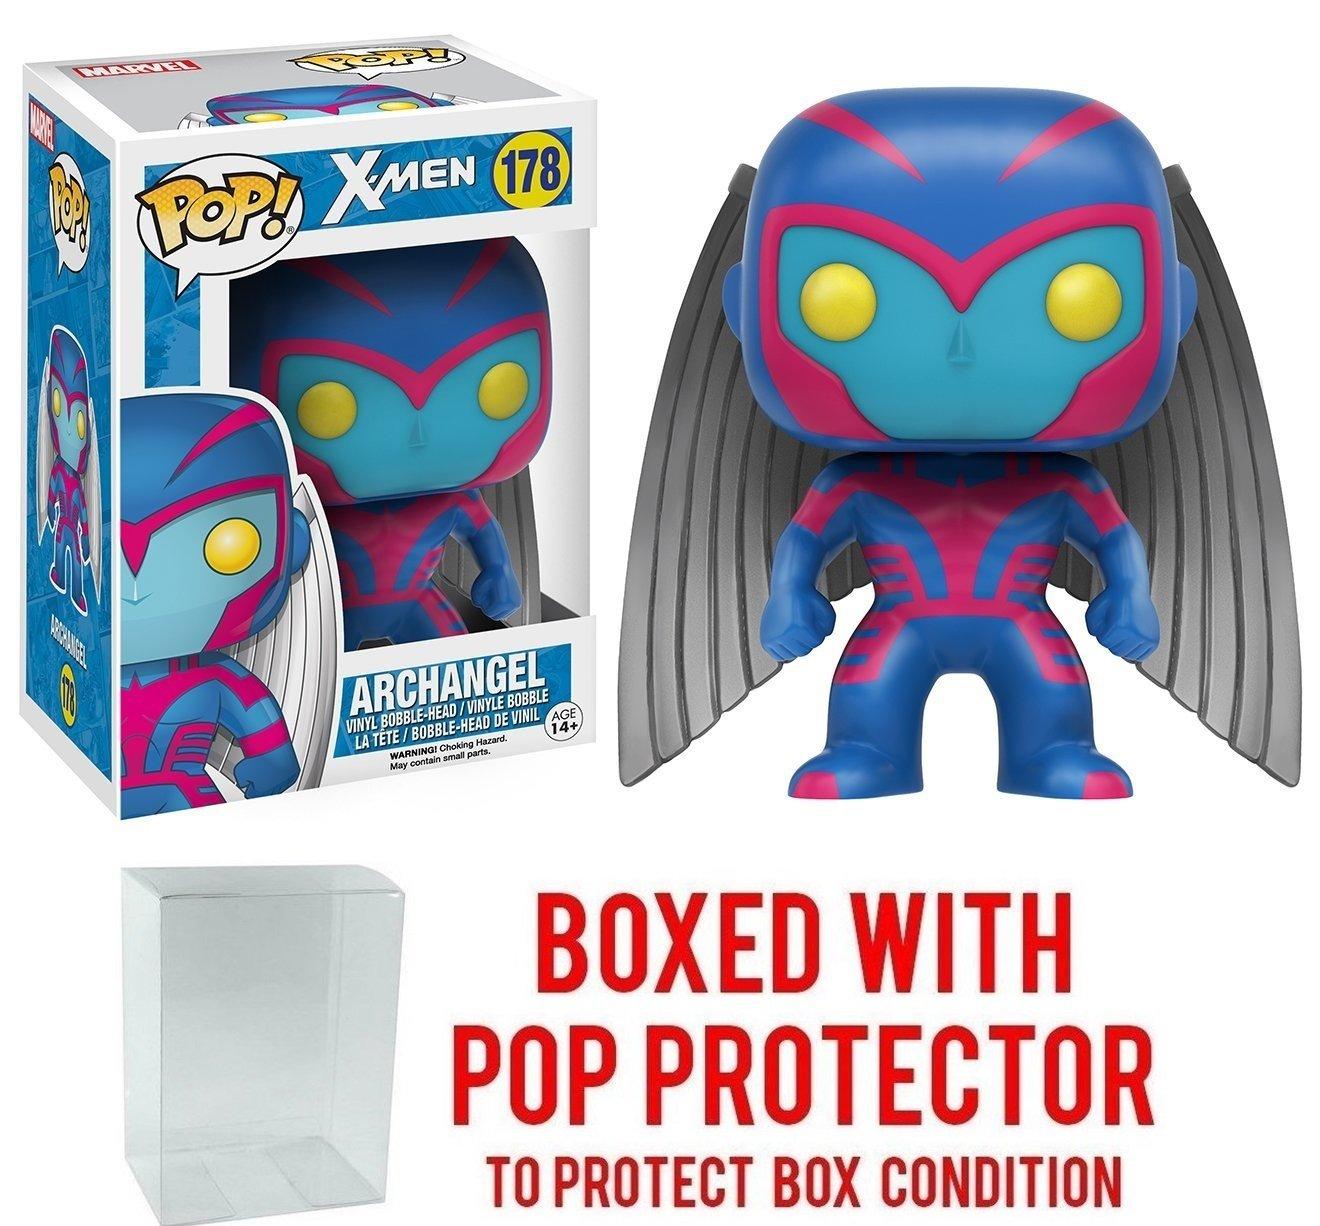 Bundled with Pop Box Protector CASE Funko Pop Marvel X-Men Archangel #178 Vinyl Figure